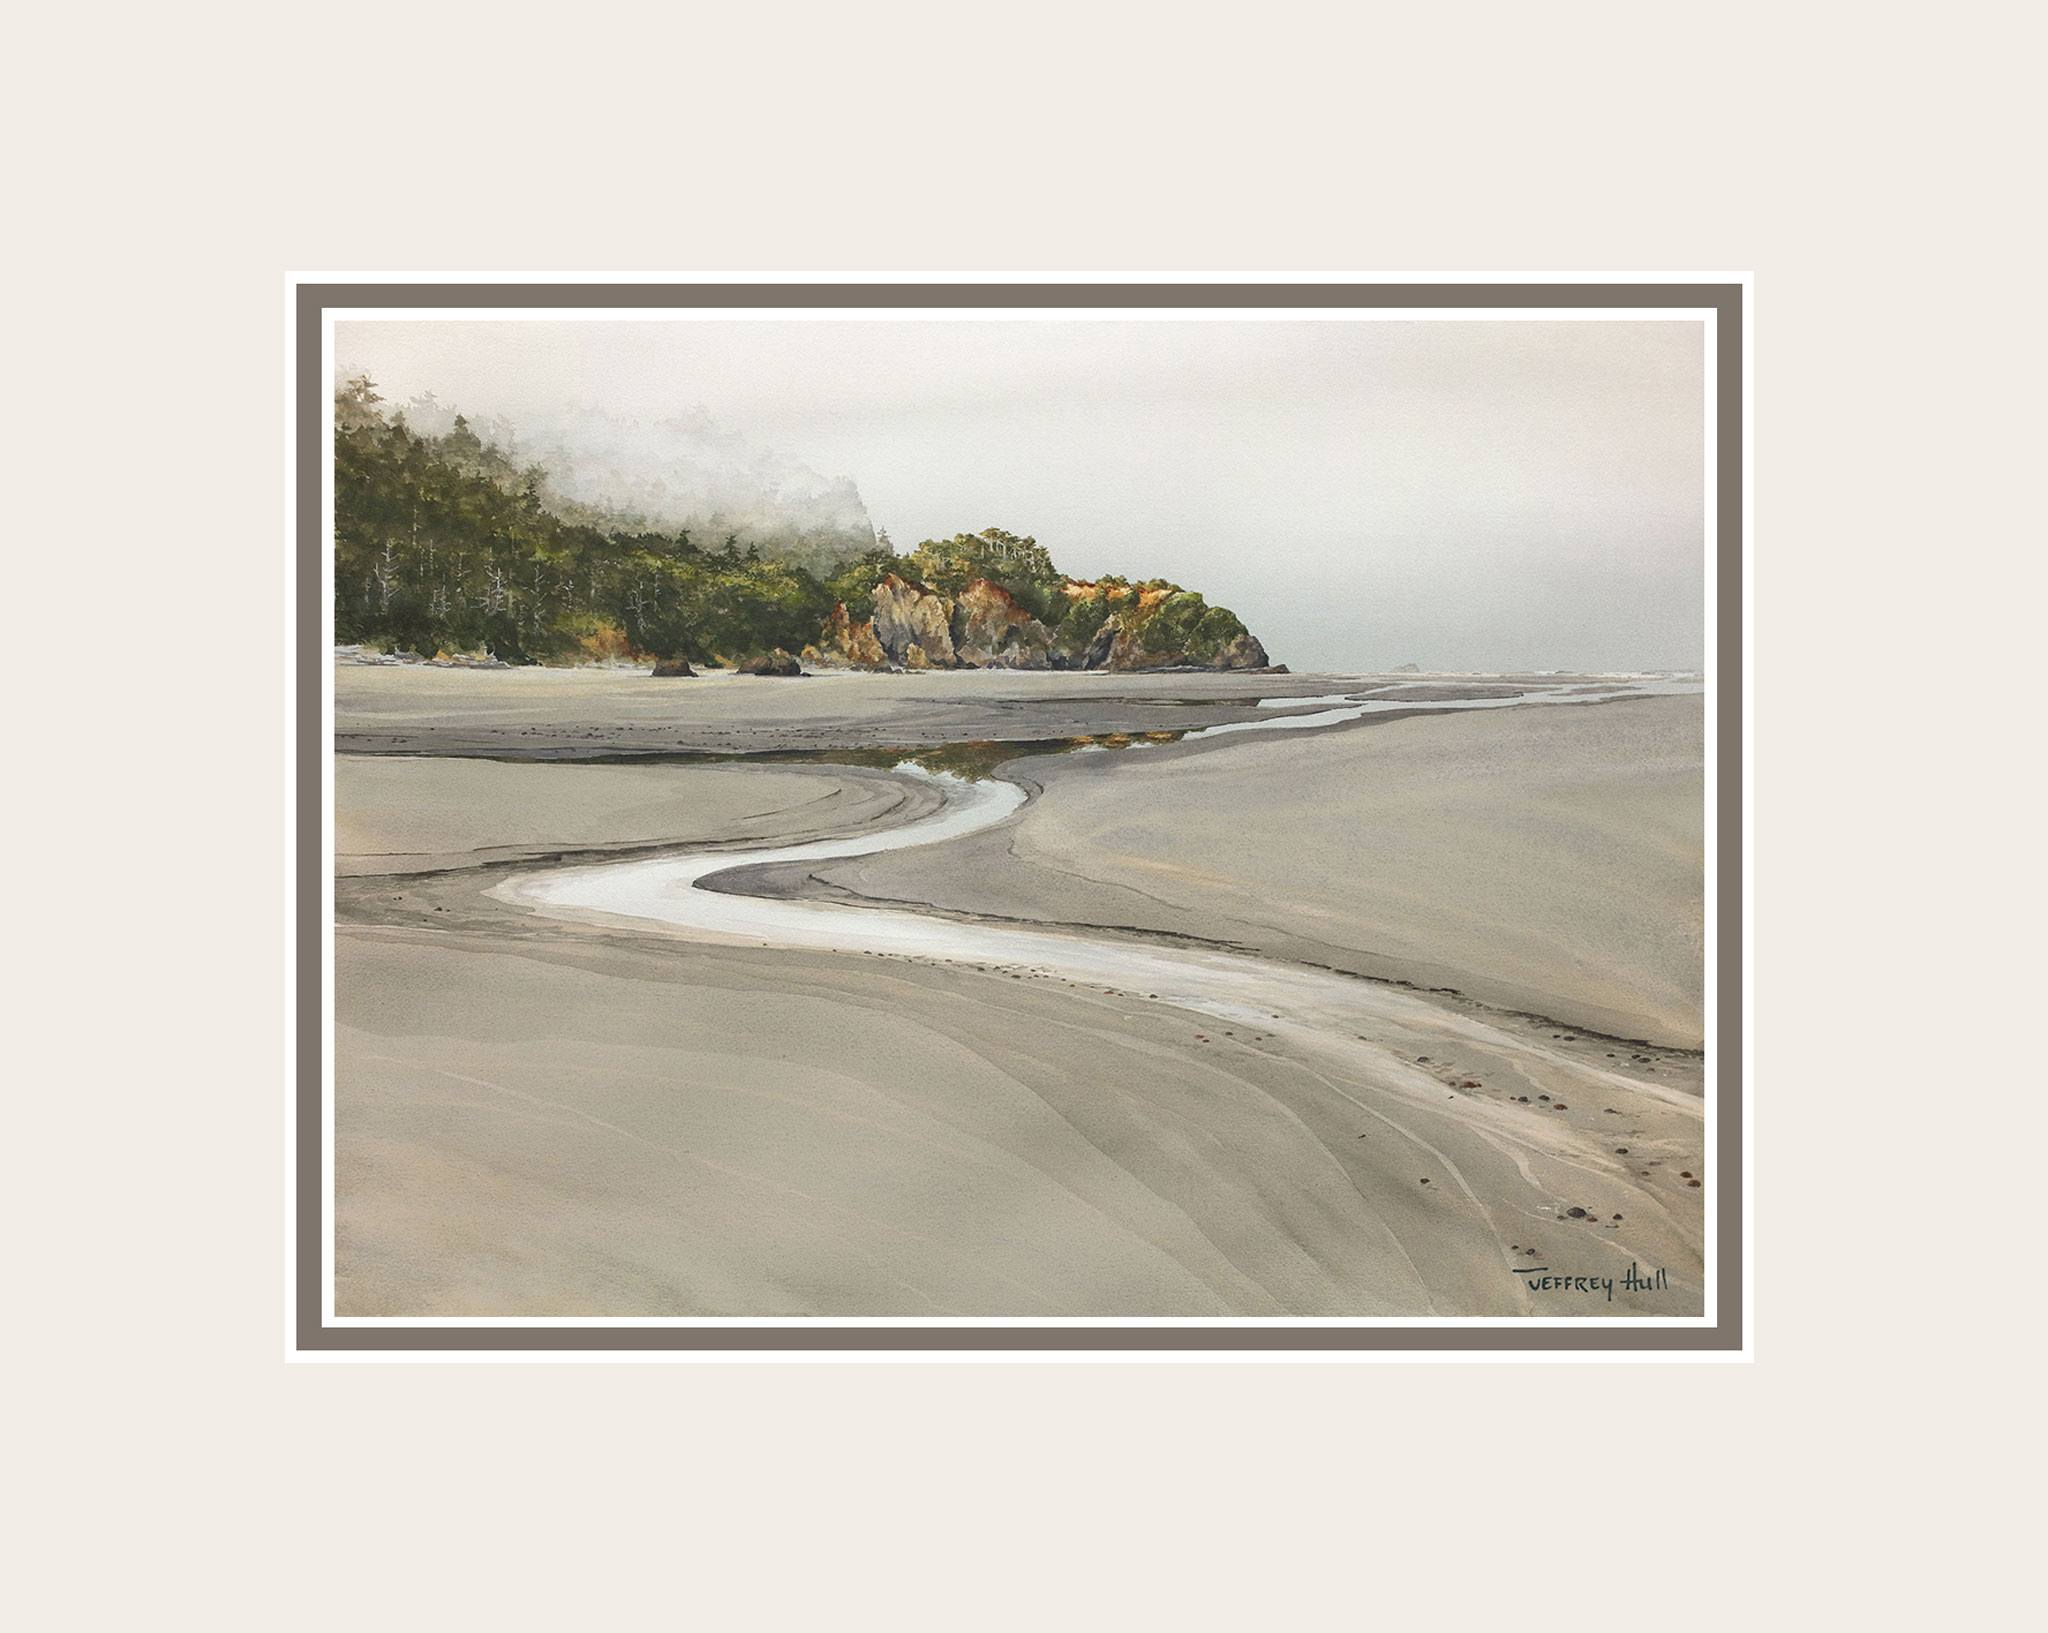 Heading-To-Prayer-Cove-Mini-Unframed-Talc-Balmoral-4-Website-2021